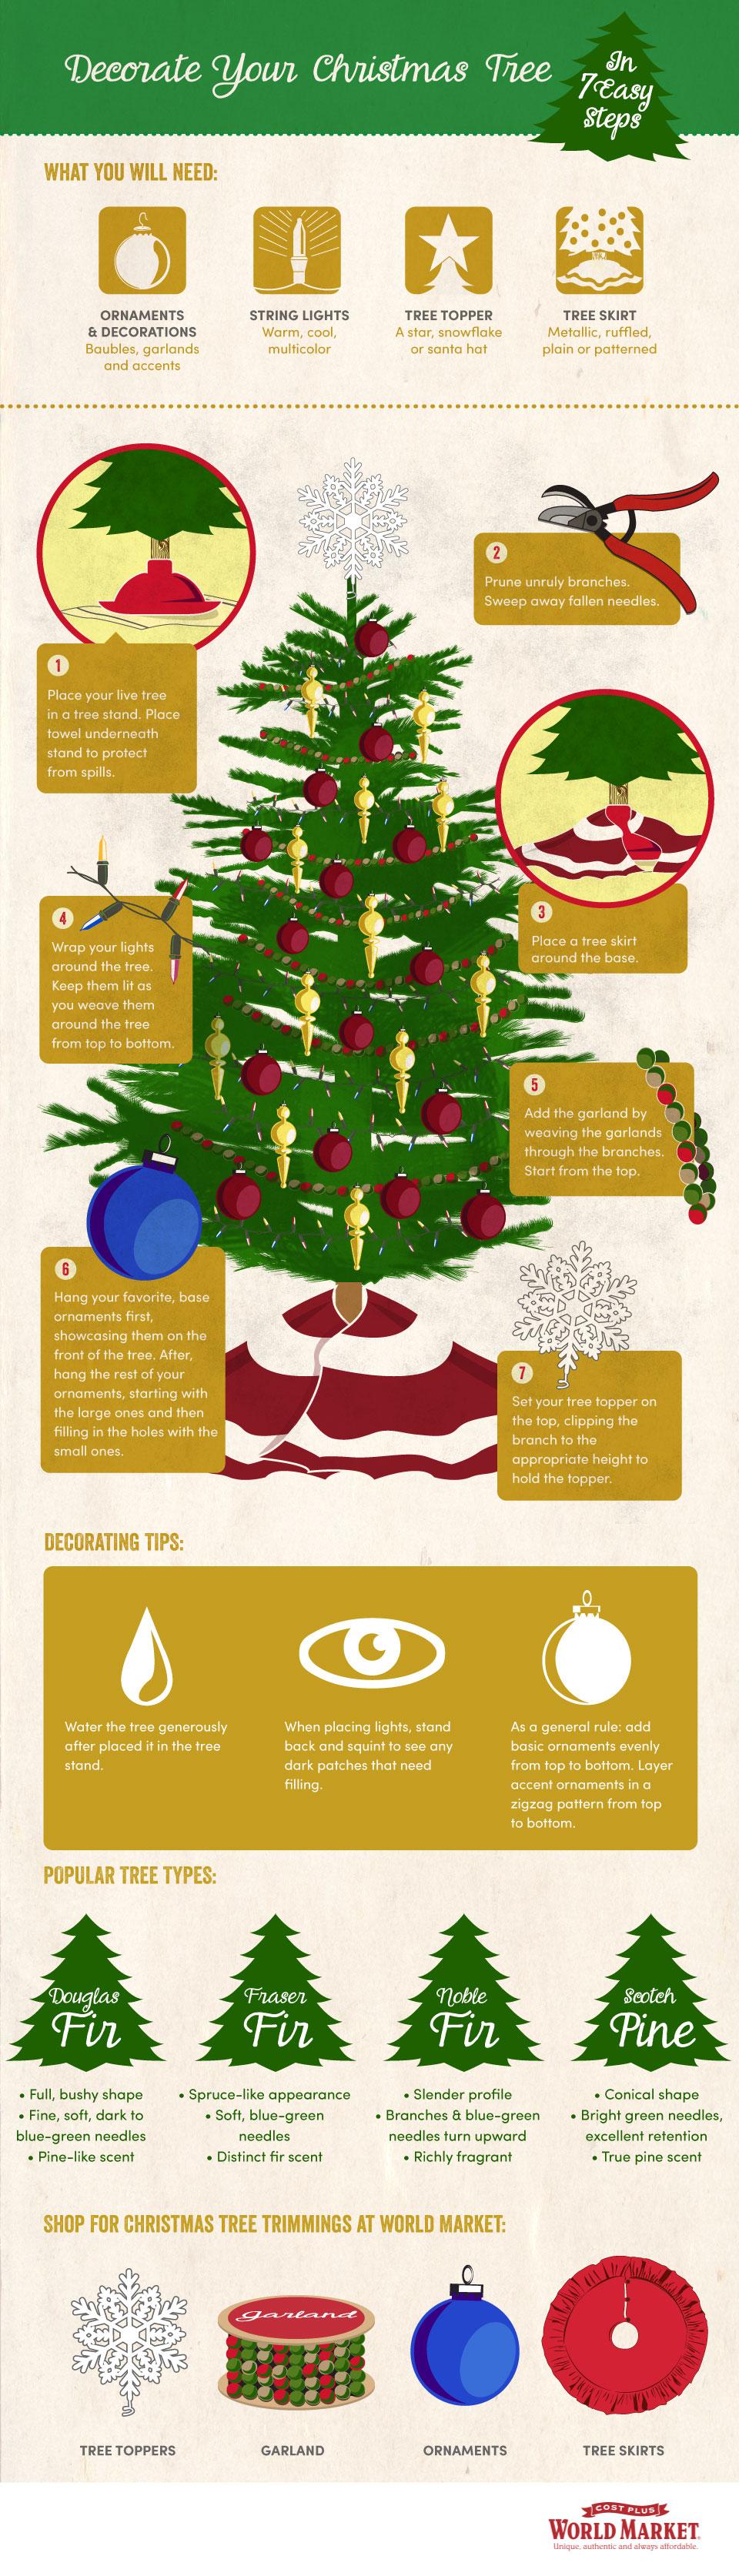 decorate-christmas-tree-infographic.jpg